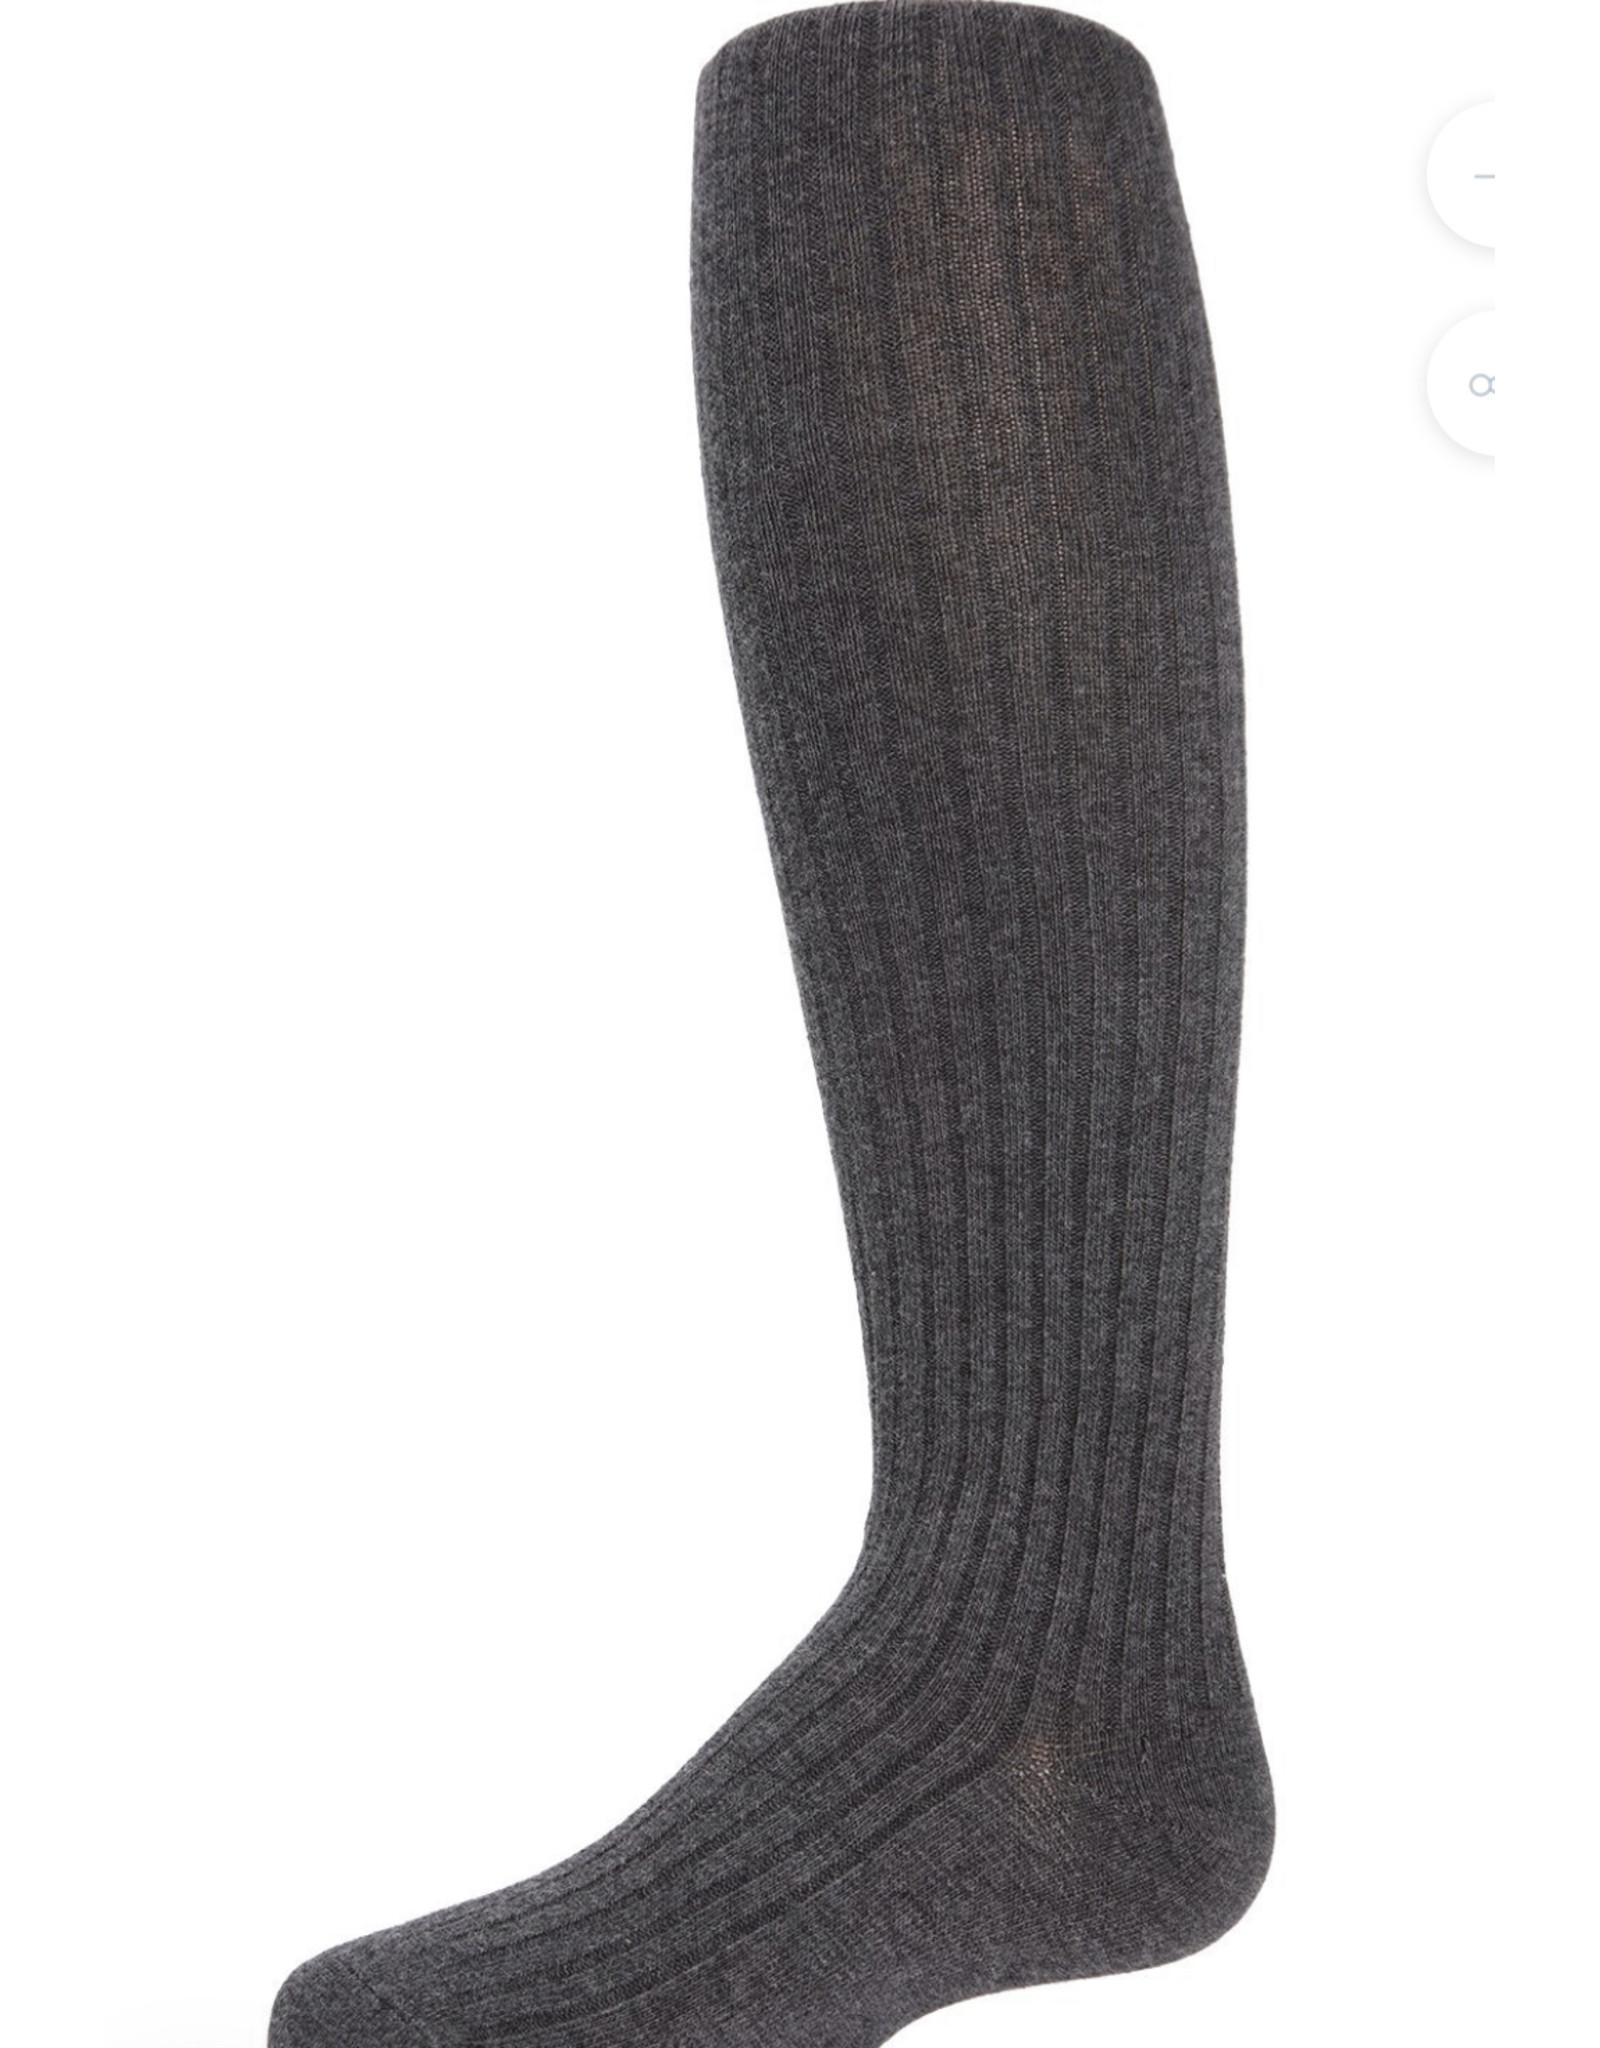 Memoi Memoi Girls Cotton Sweater Ribbed Tights SP-3405